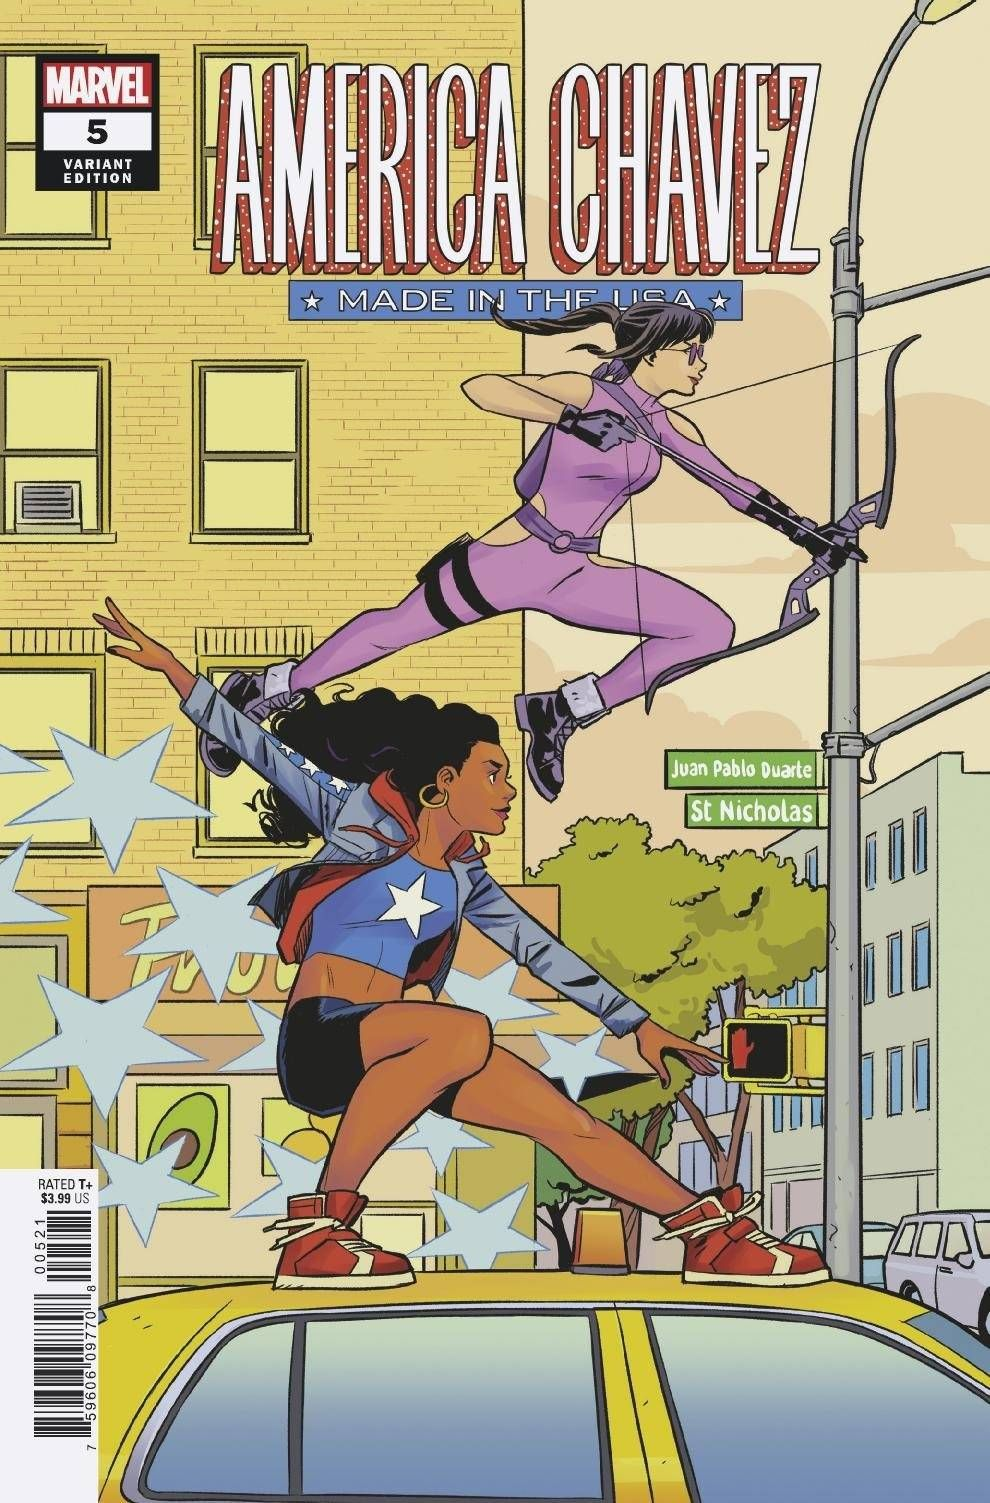 eyJidWNrZXQiOiJnb2NvbGxlY3QuaW1hZ2VzLnB1YiIsImtleSI6IjYzZWJkZWI2LTI1ZWYtNDNkZS04YWM0LTlmZjAxZmRkZmE0Yy5qcGciLCJlZGl0cyI6W119 ComicList: Marvel Comics New Releases for 08/11/2021